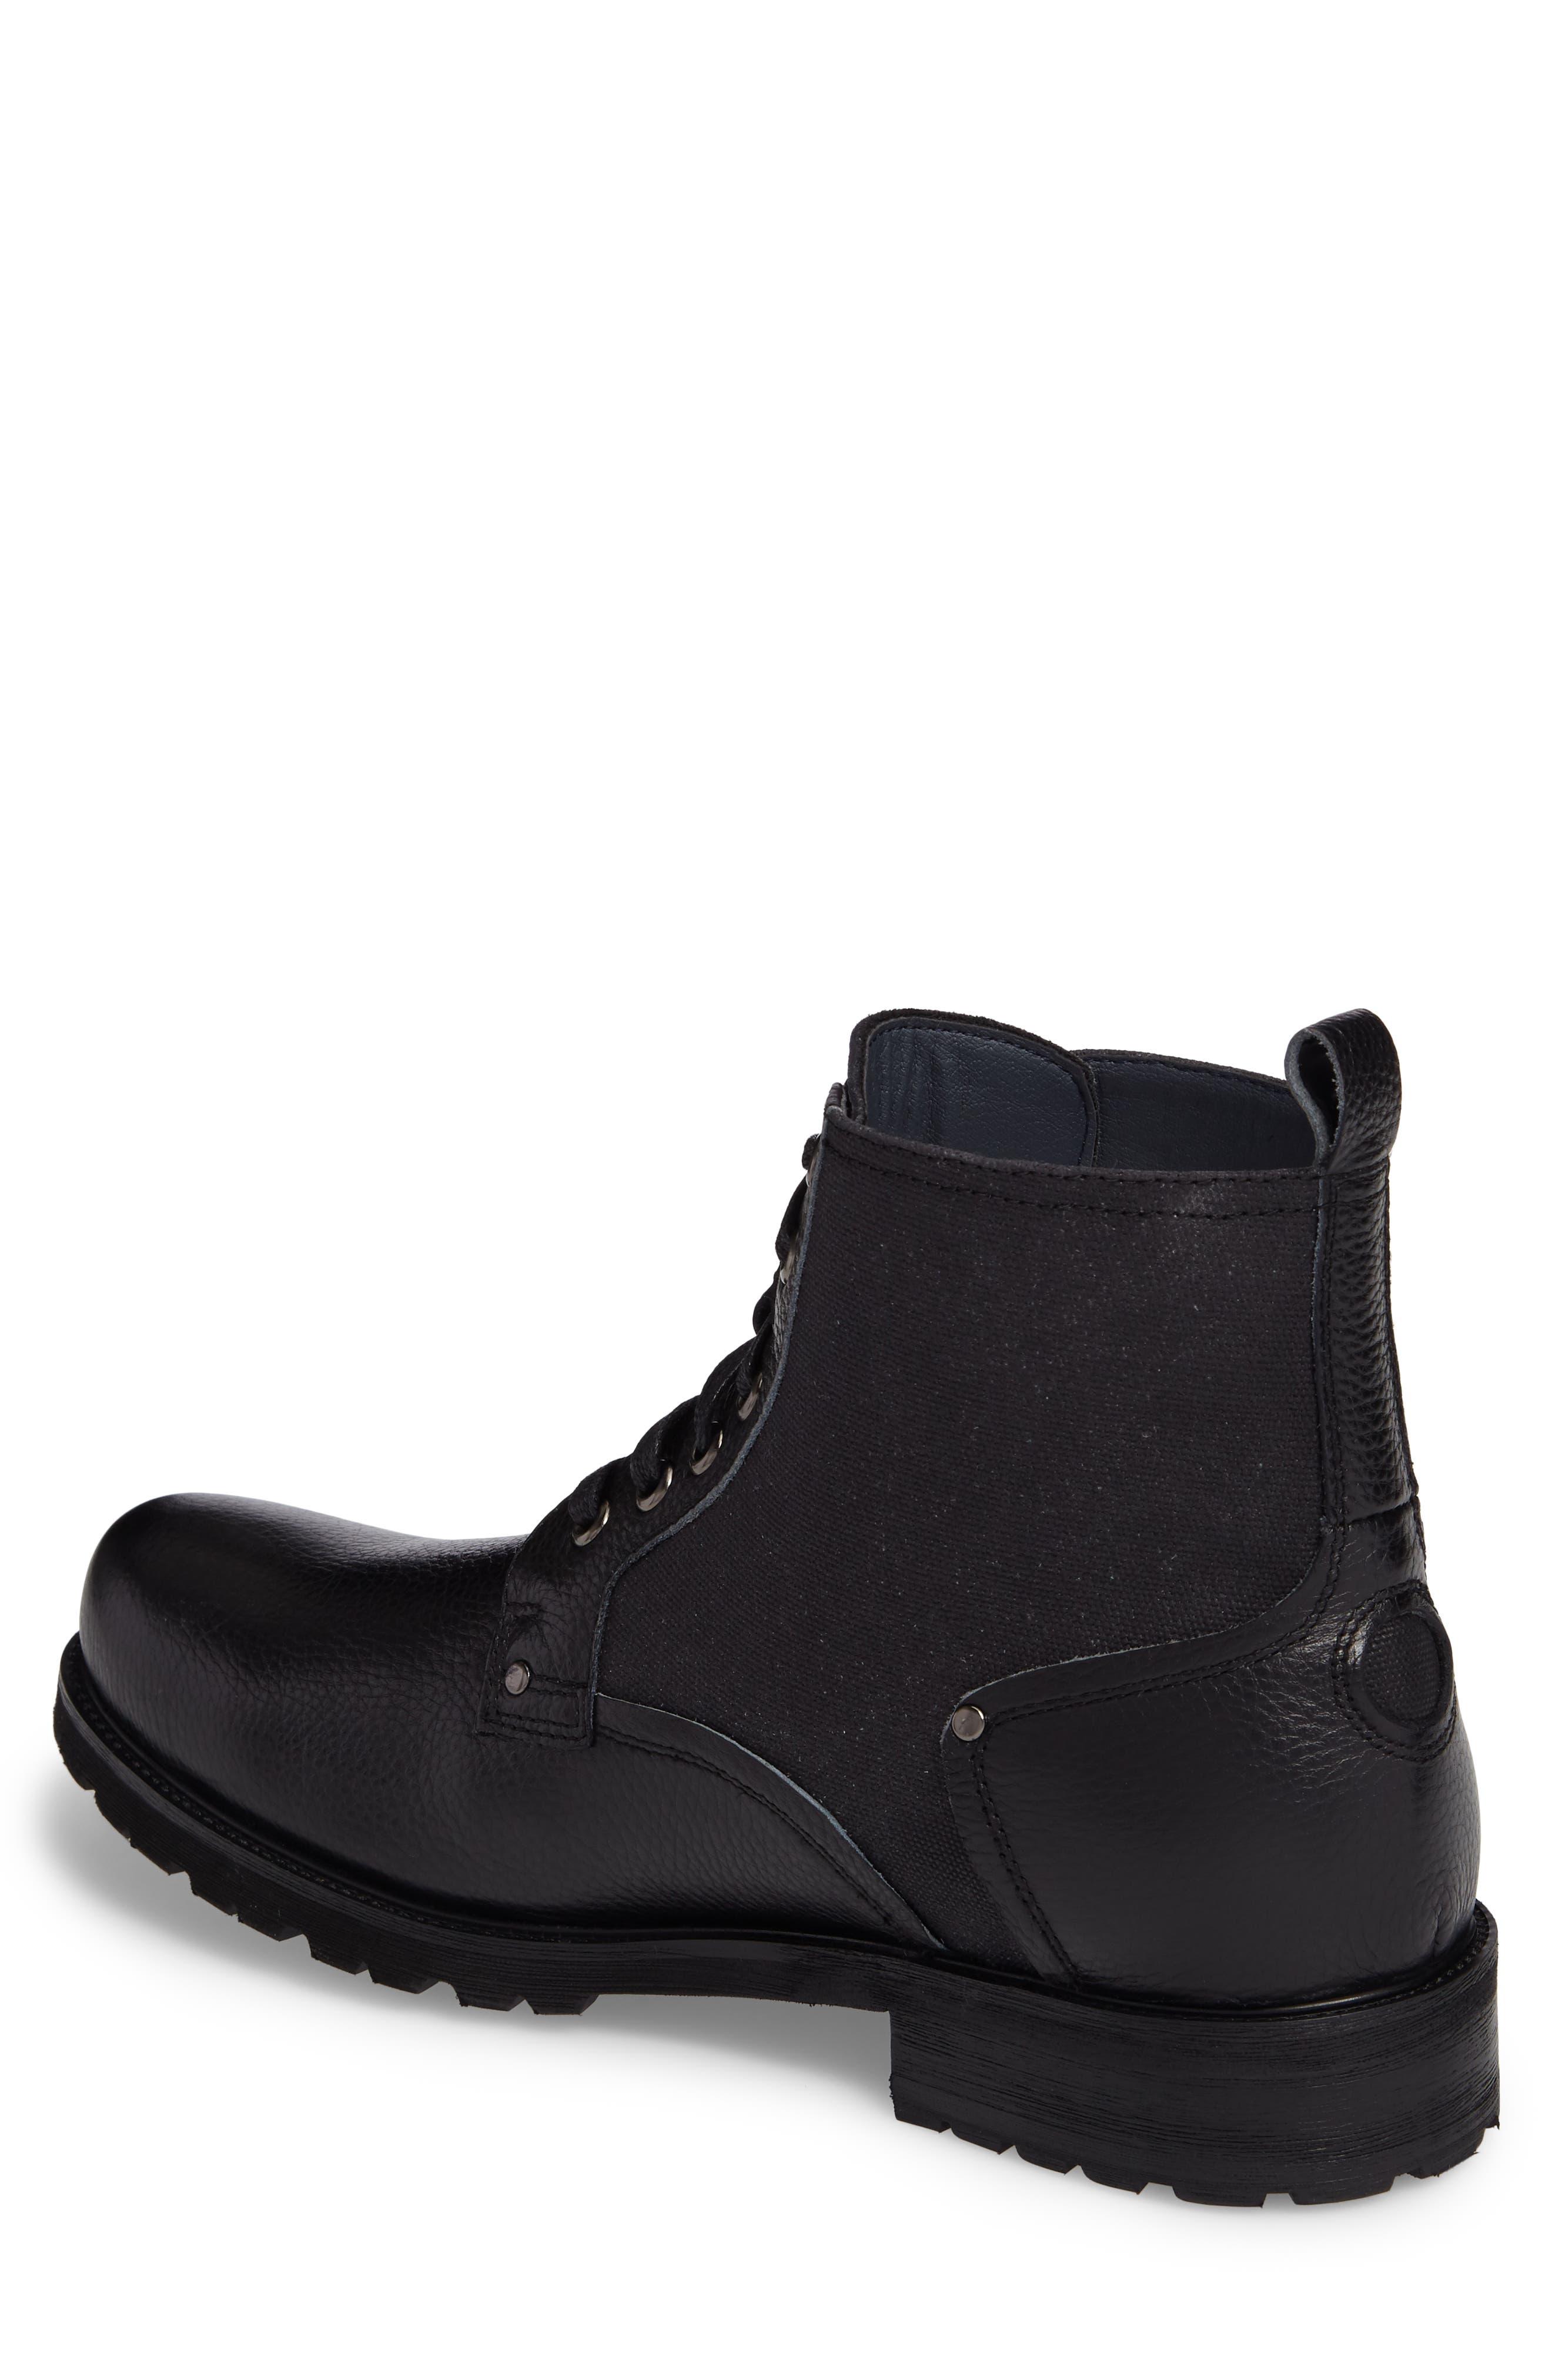 Whitley Plain Toe Boot,                             Alternate thumbnail 3, color,